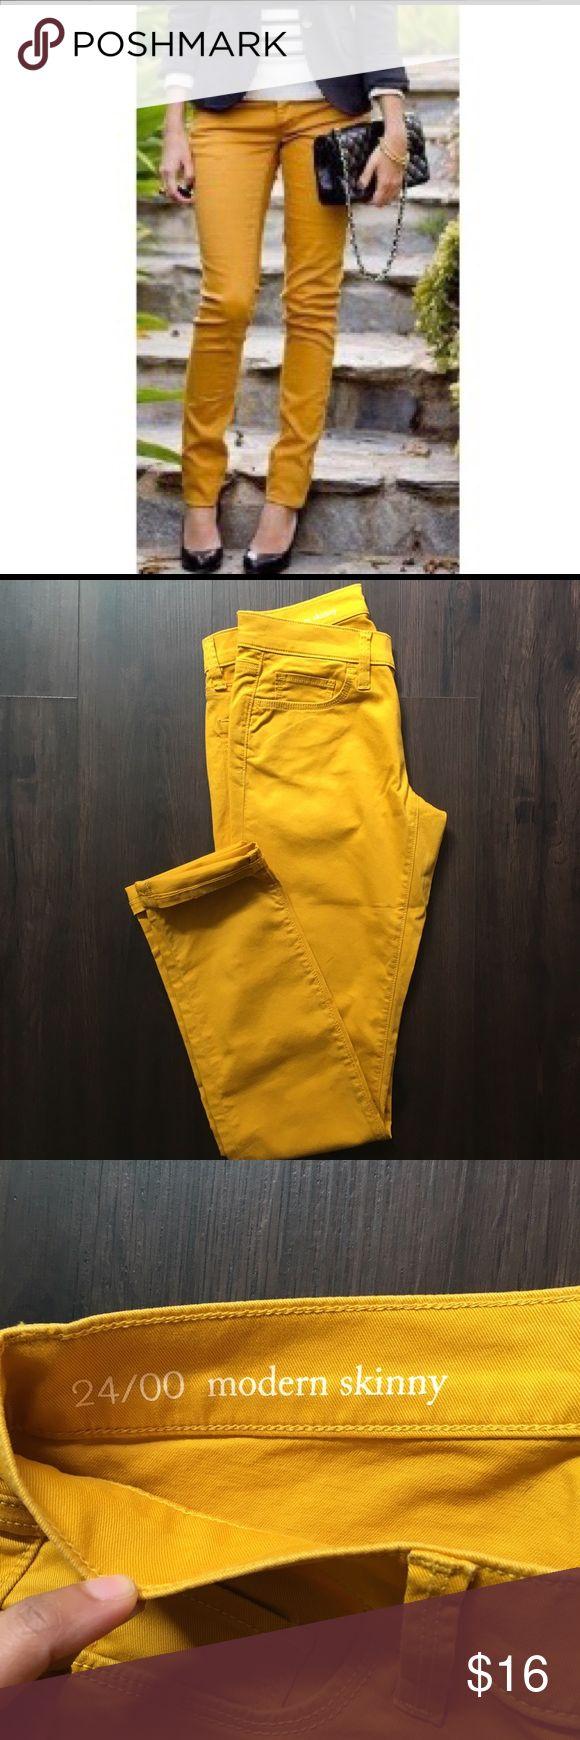 🎉HOST PICK!🎉 NEW Loft Modern Skinny Jeans Mustard yellow skinny jeans, never worn! LOFT Jeans Skinny